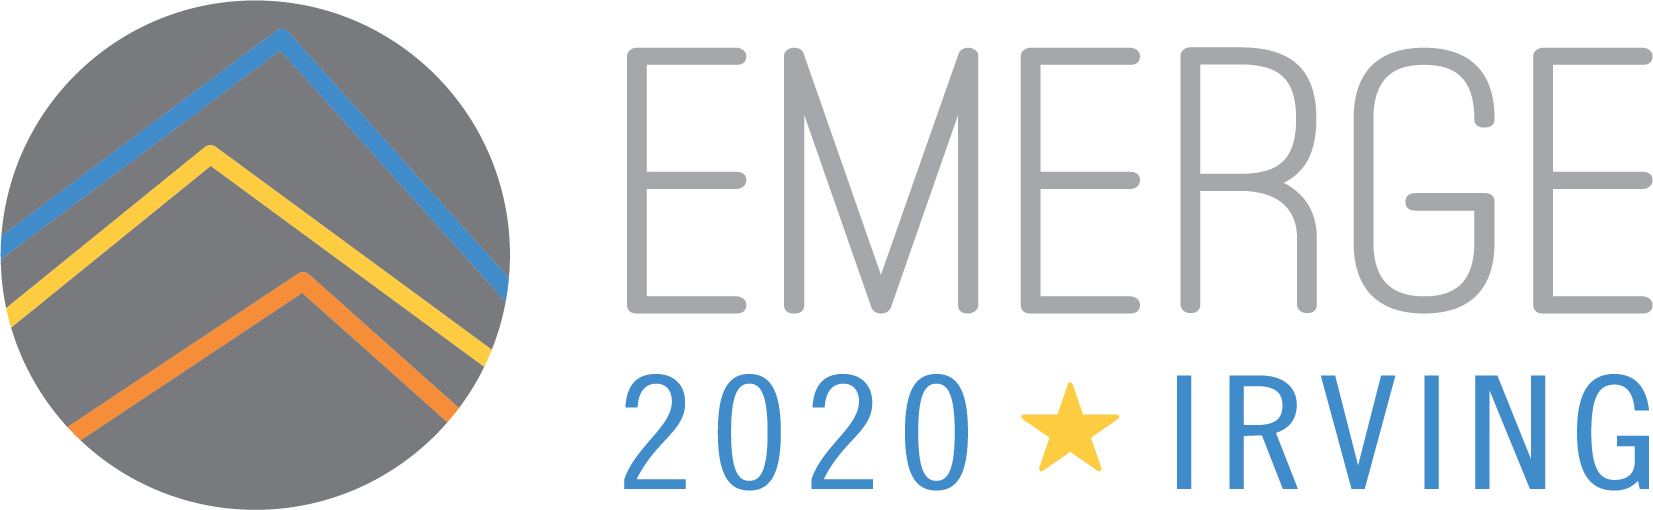 EMERGE20 logo.png